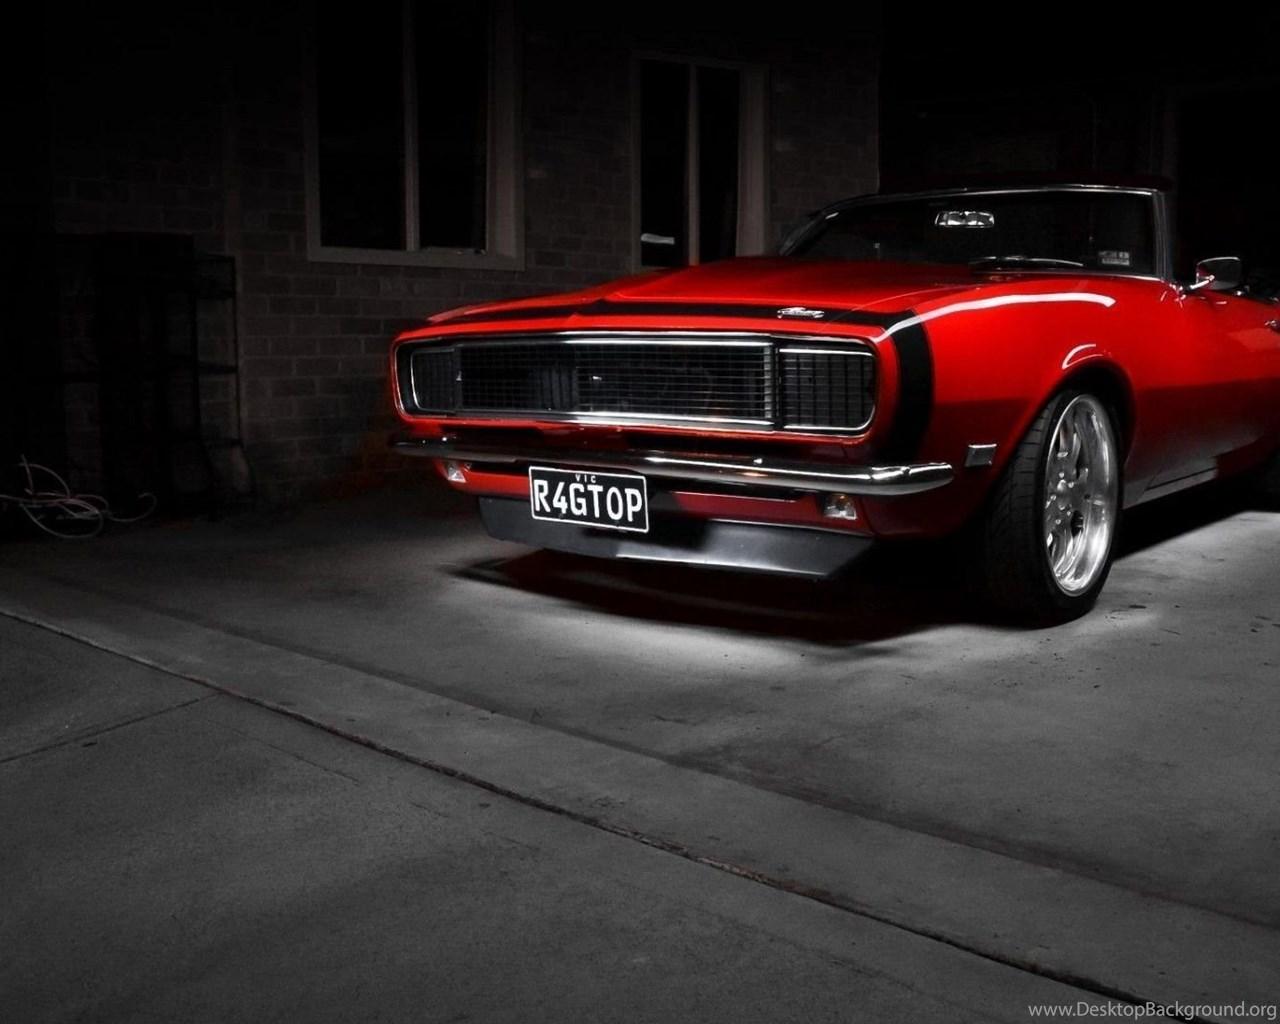 Hd Quality Best Muscle Car Wallpapers Hd 1 Siwallpapers 7206 Desktop